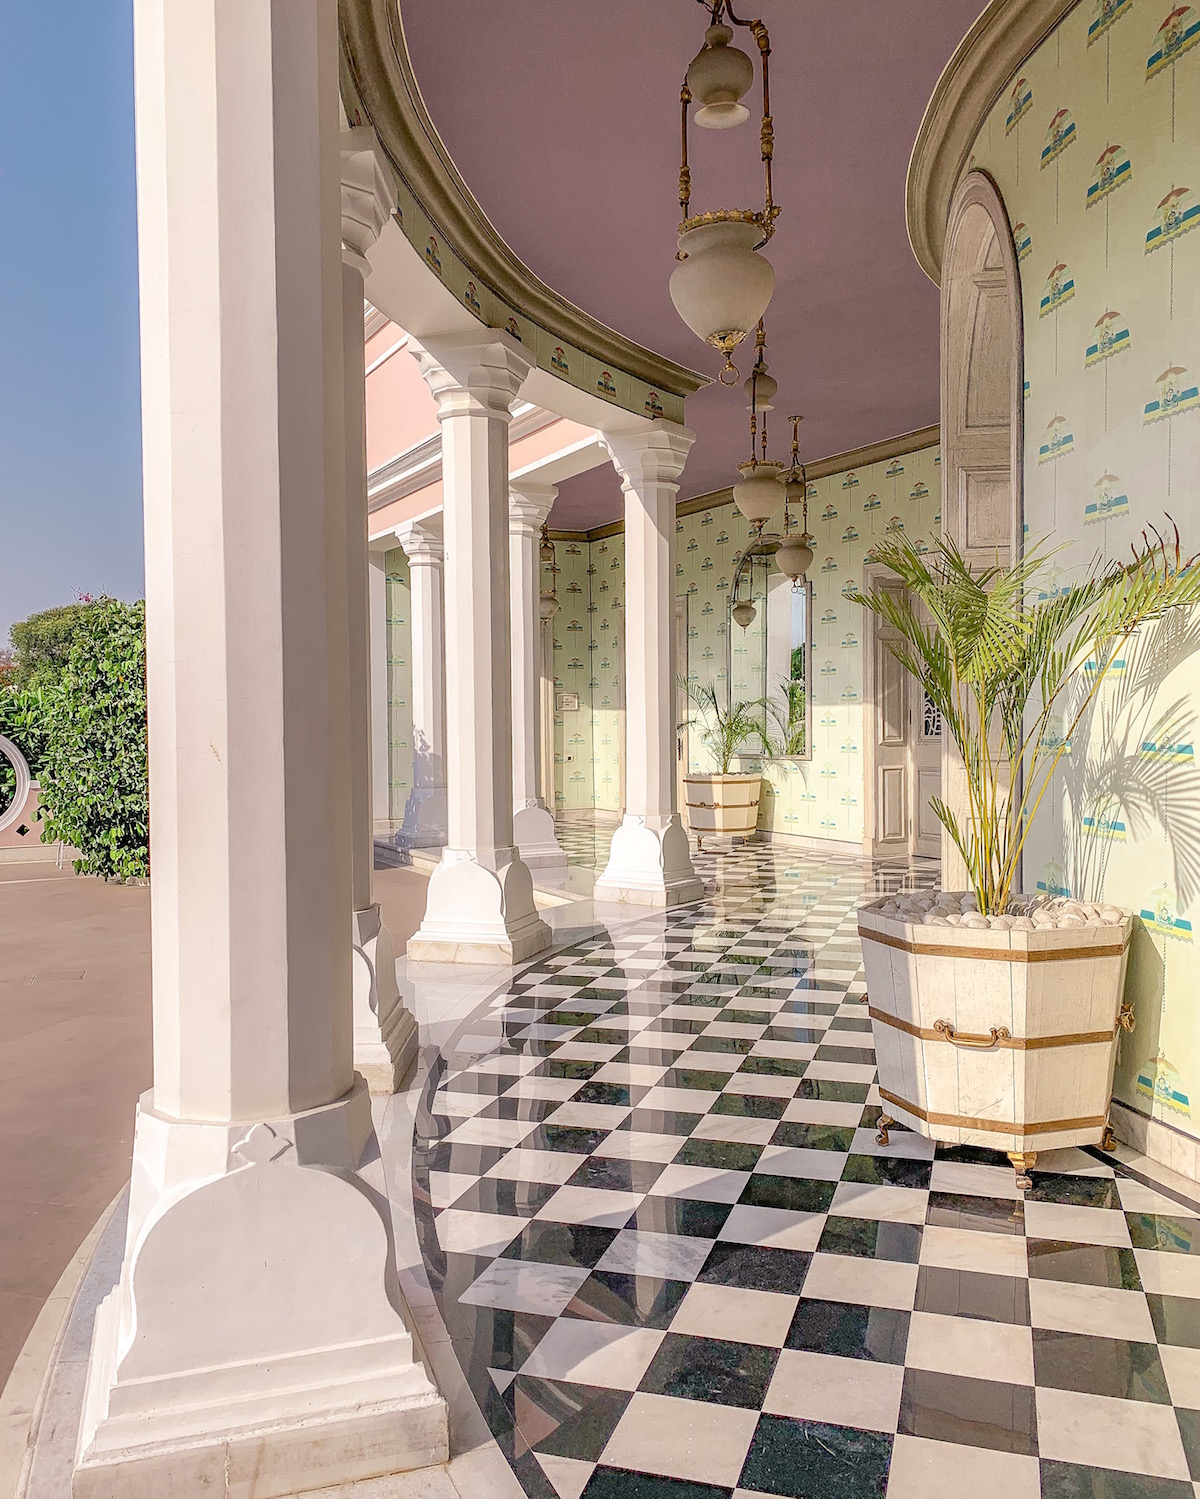 Suján Rahmahal Palace Jaipur India